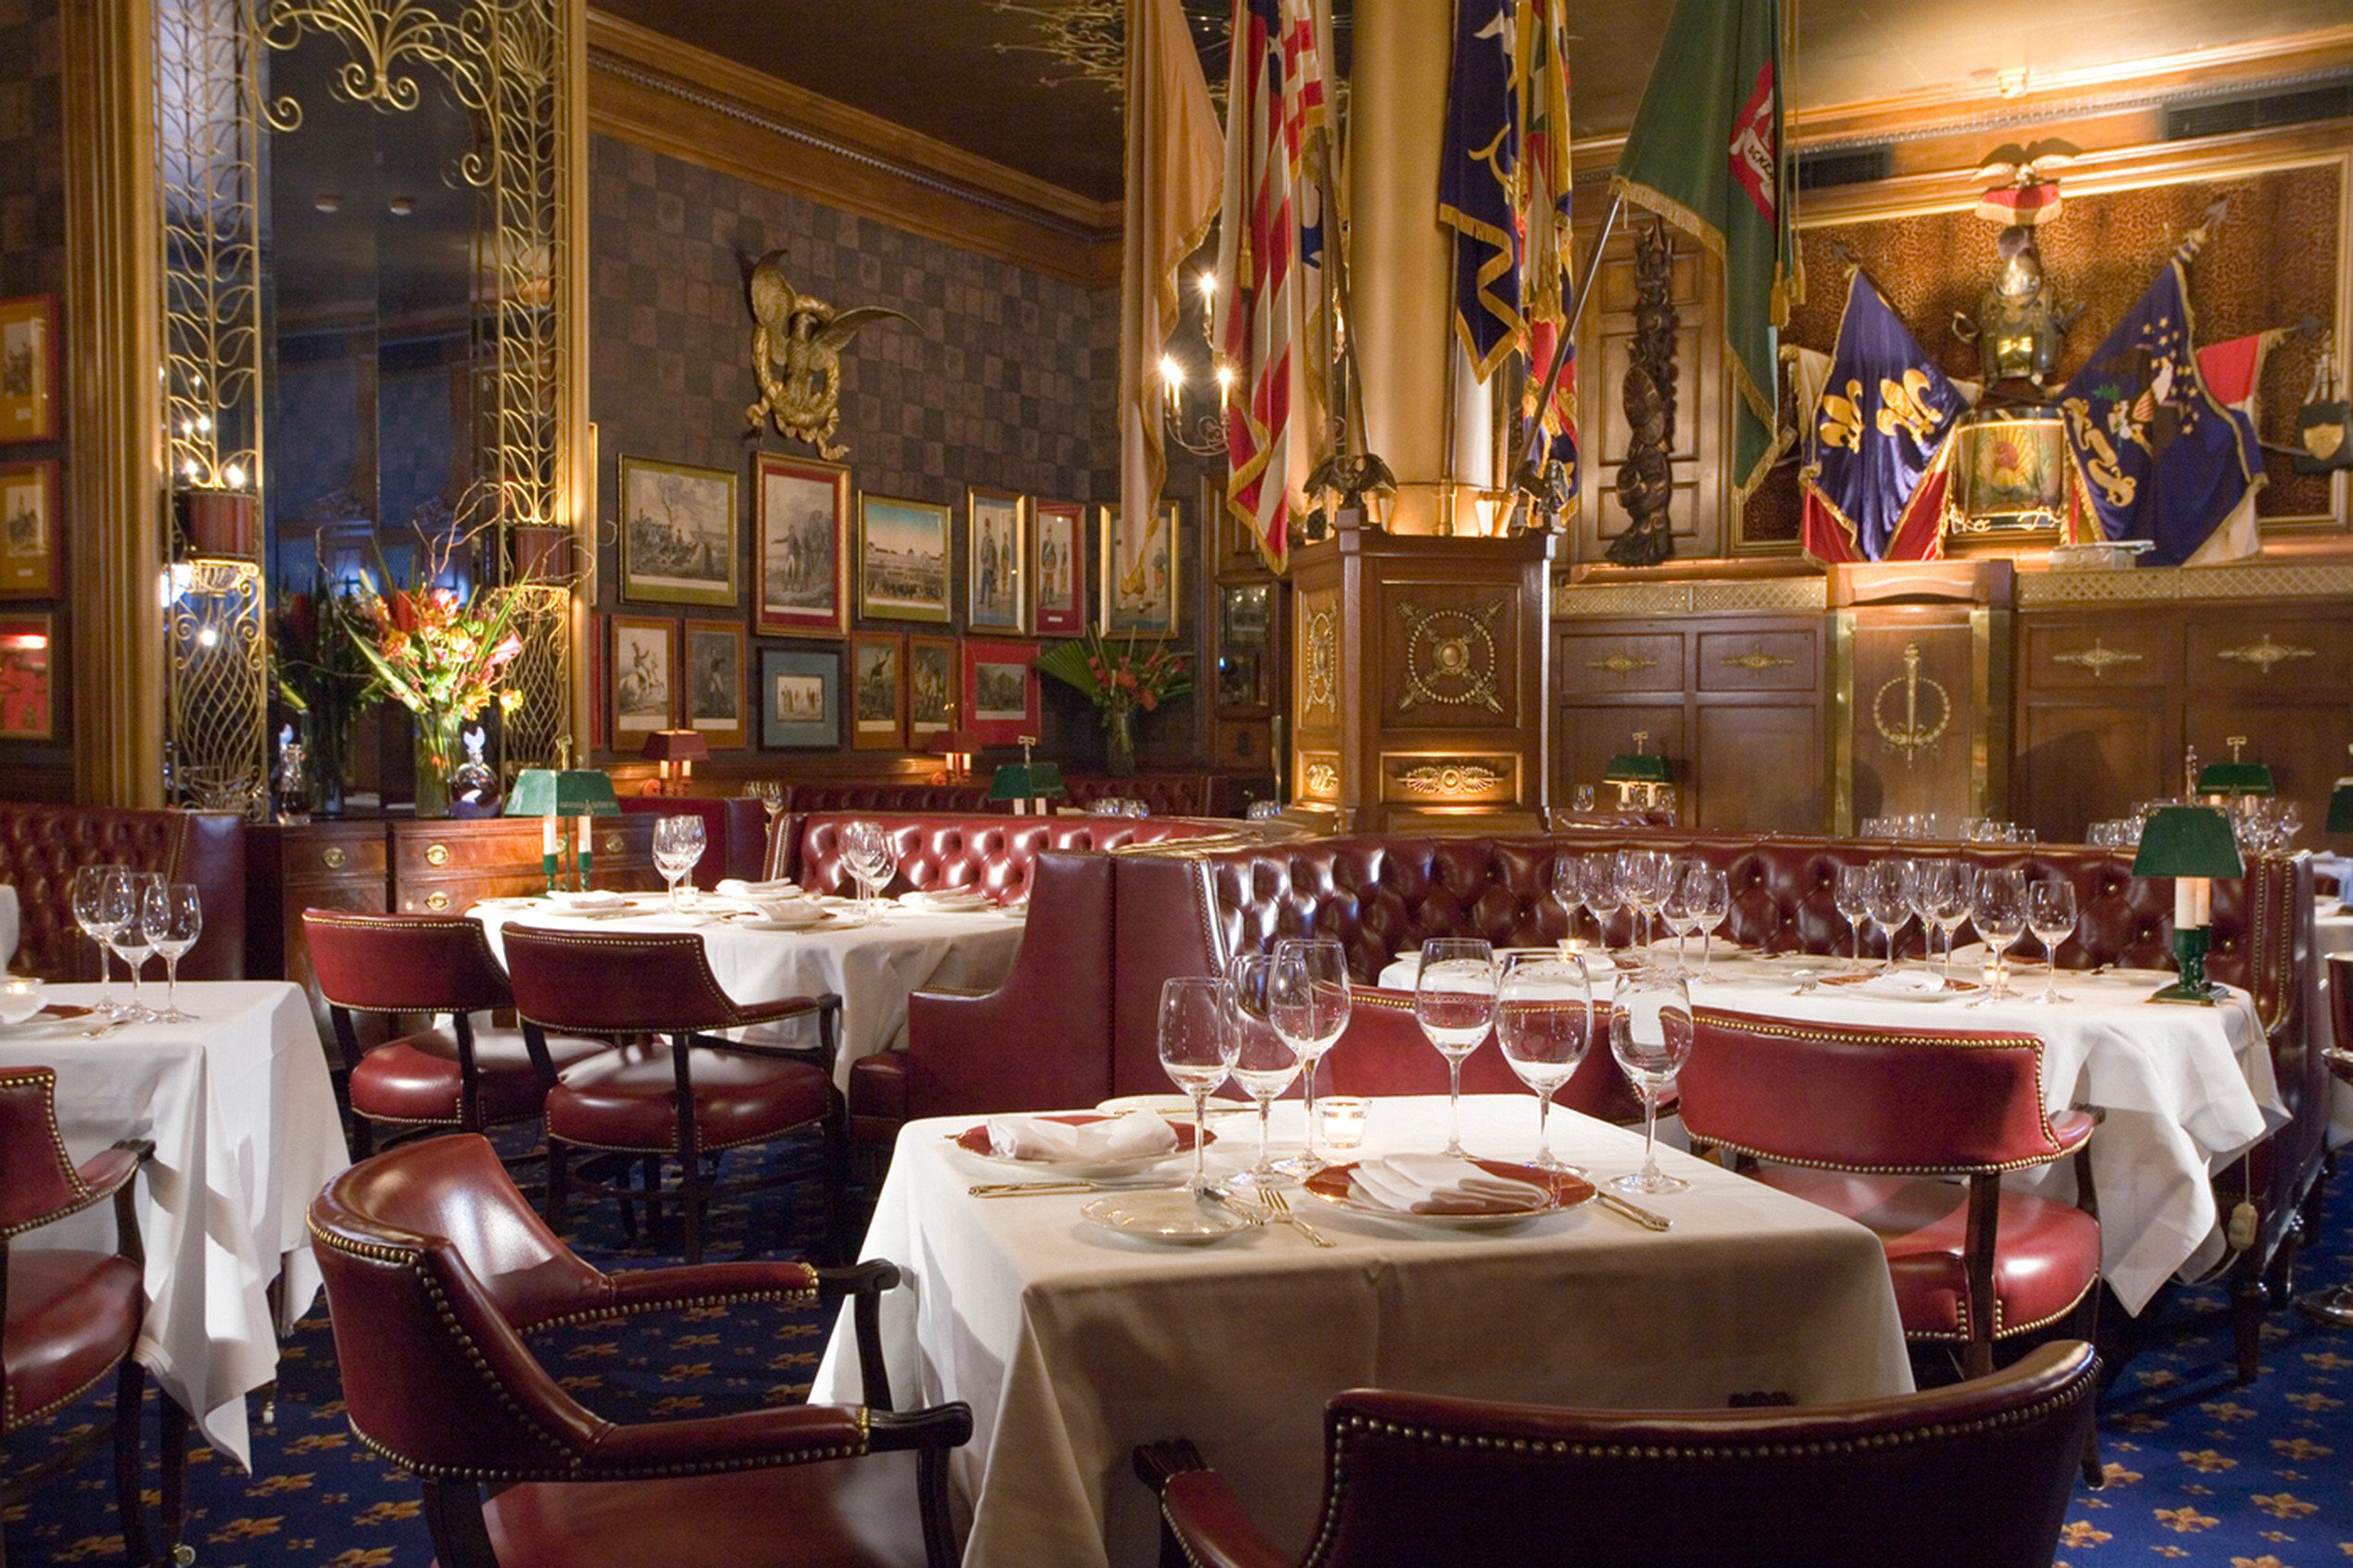 Bar Dining Drink Eat Elegant Historic Hotels restaurant function hall